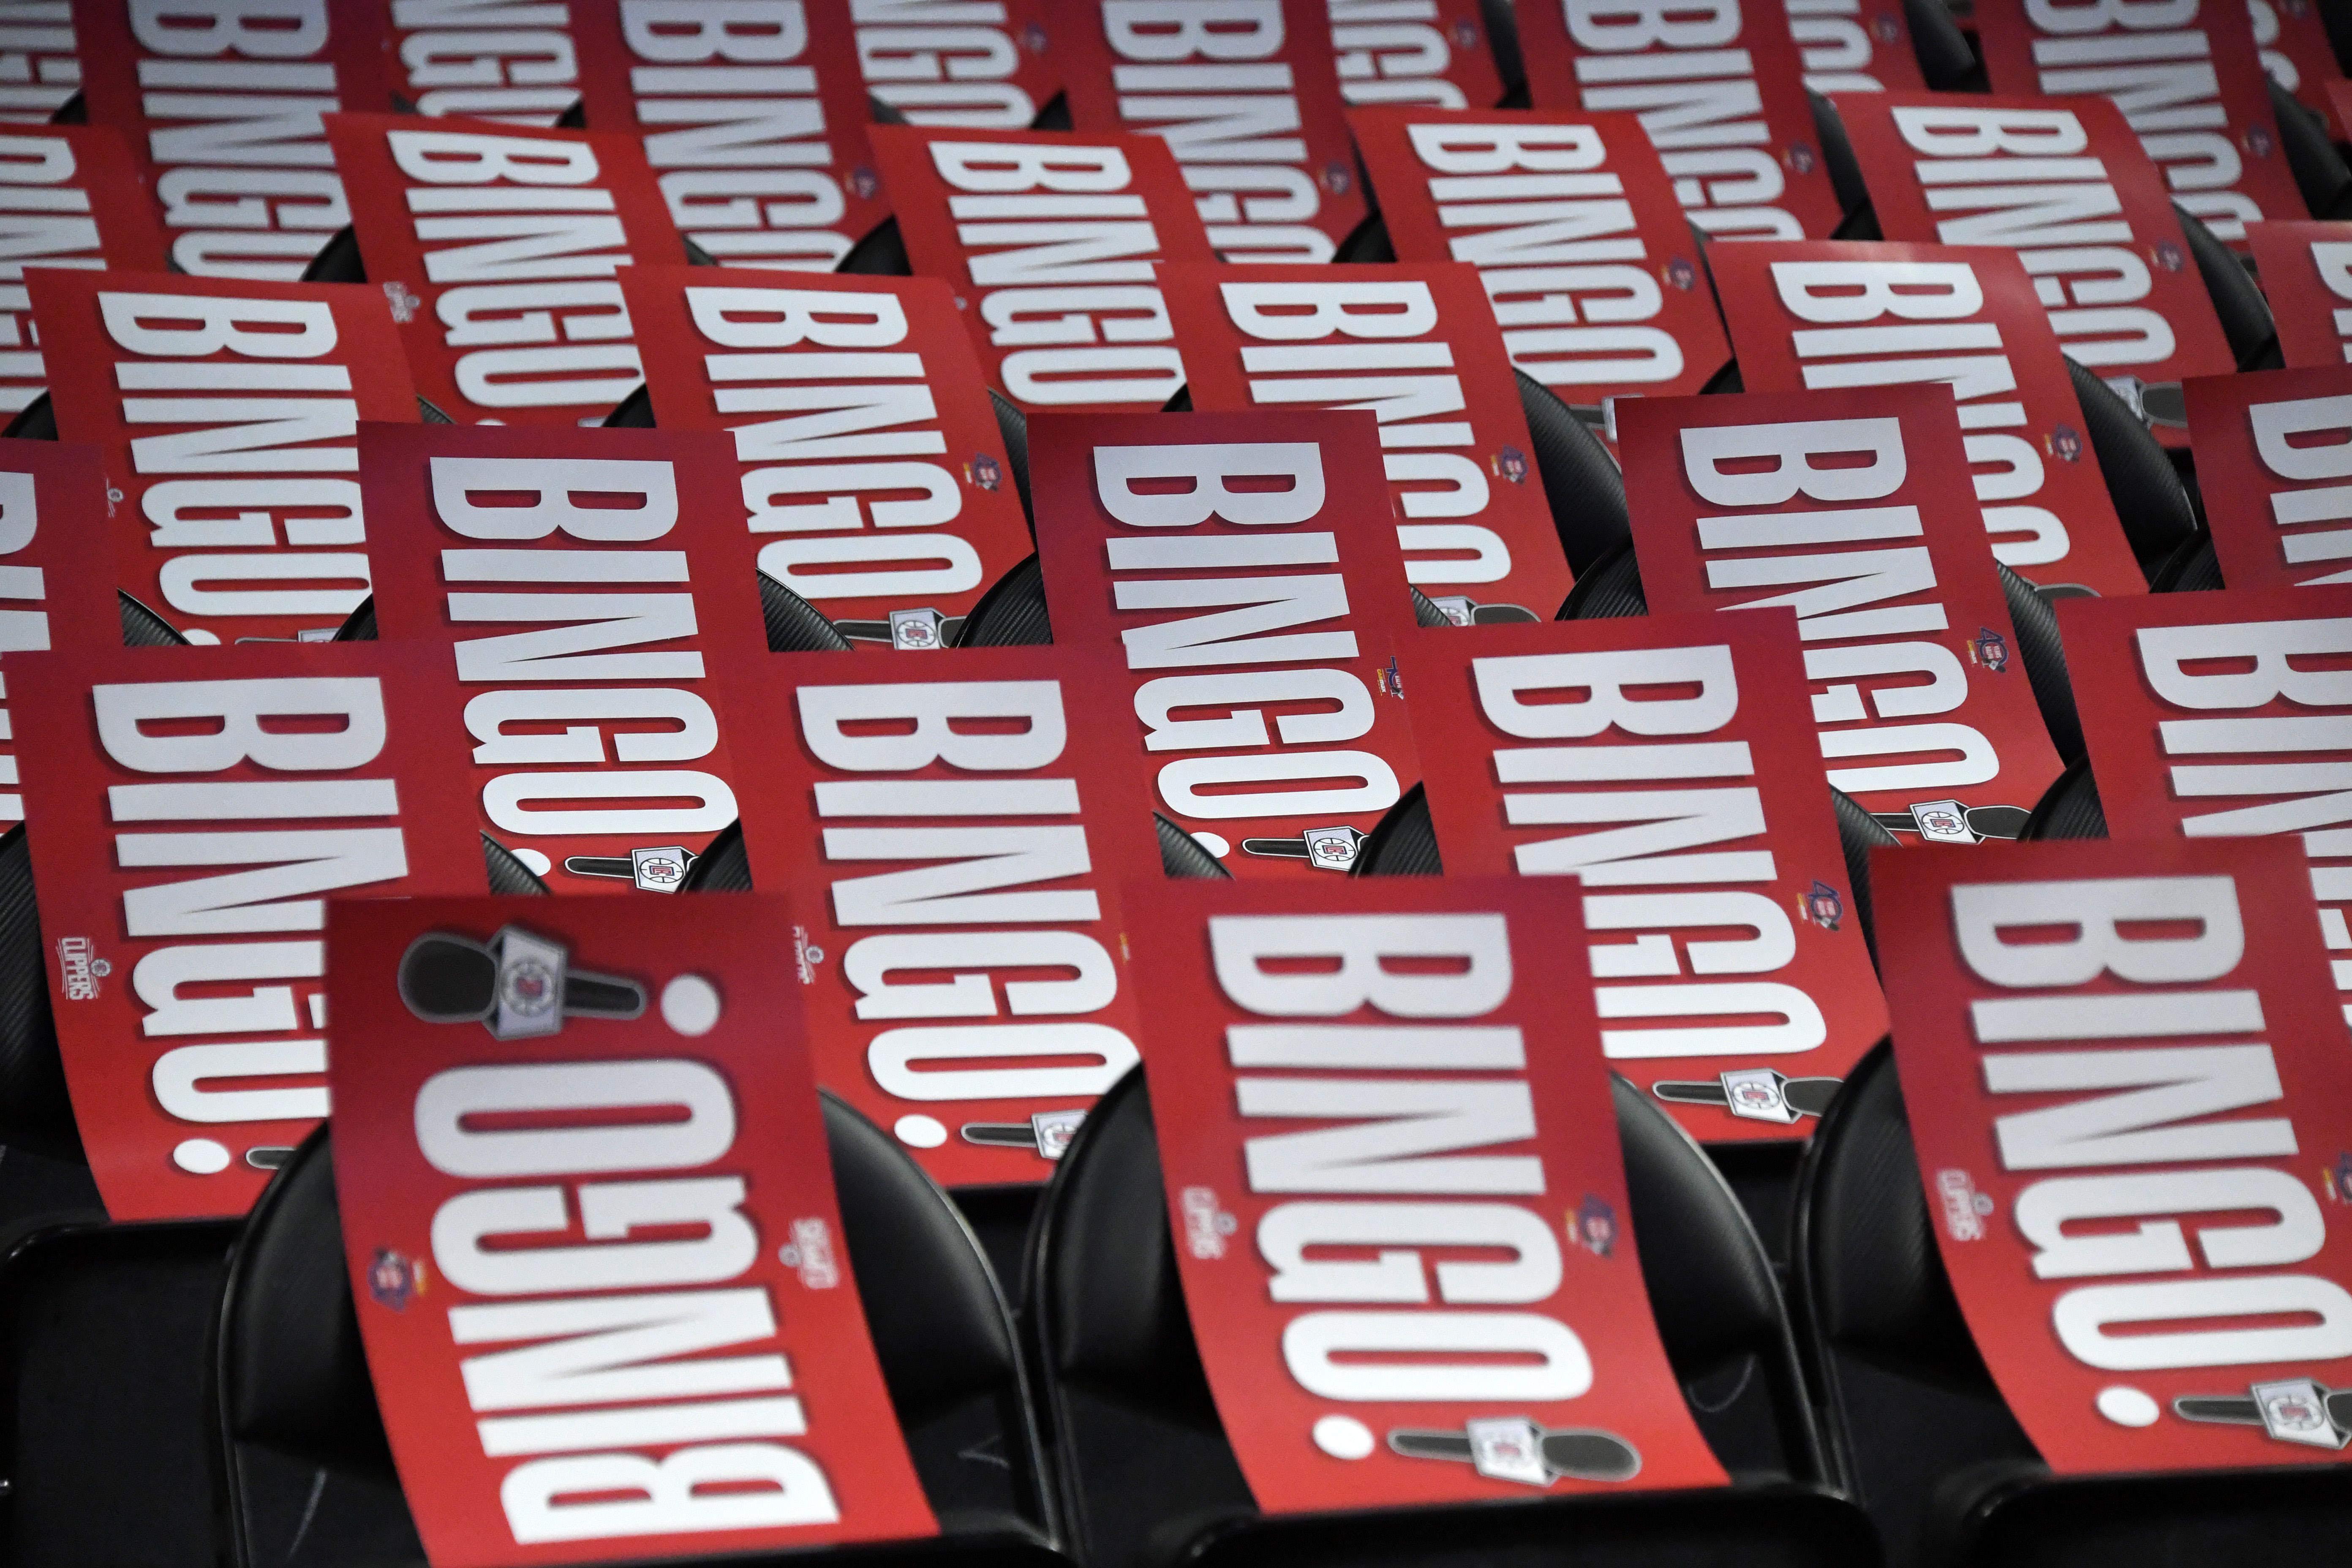 How bingo games became a popular cultural phenomenon